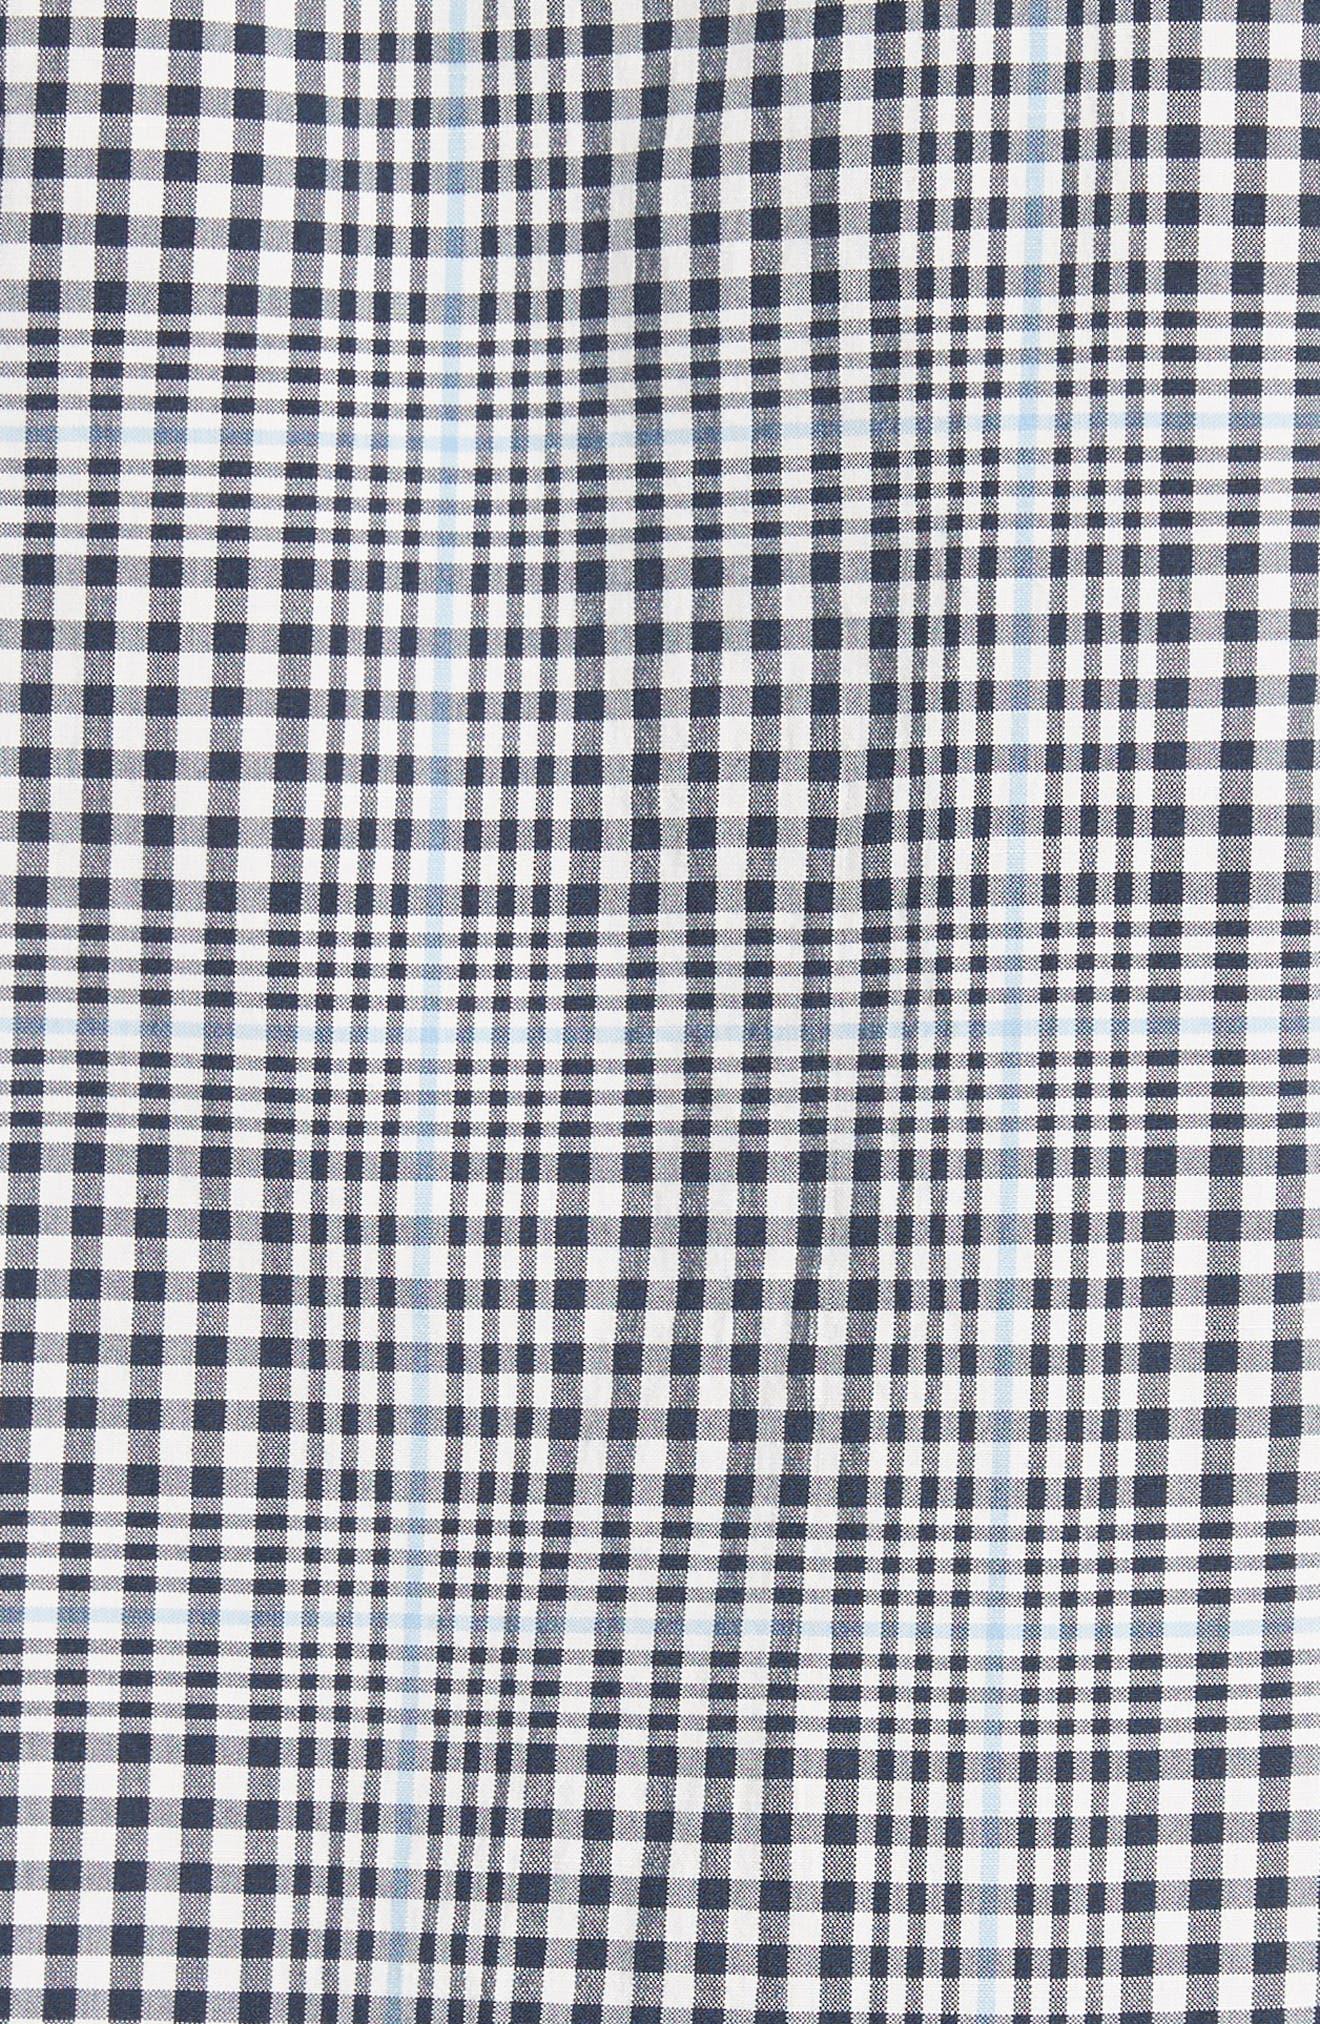 John Check Woven Shirt,                             Alternate thumbnail 5, color,                             410